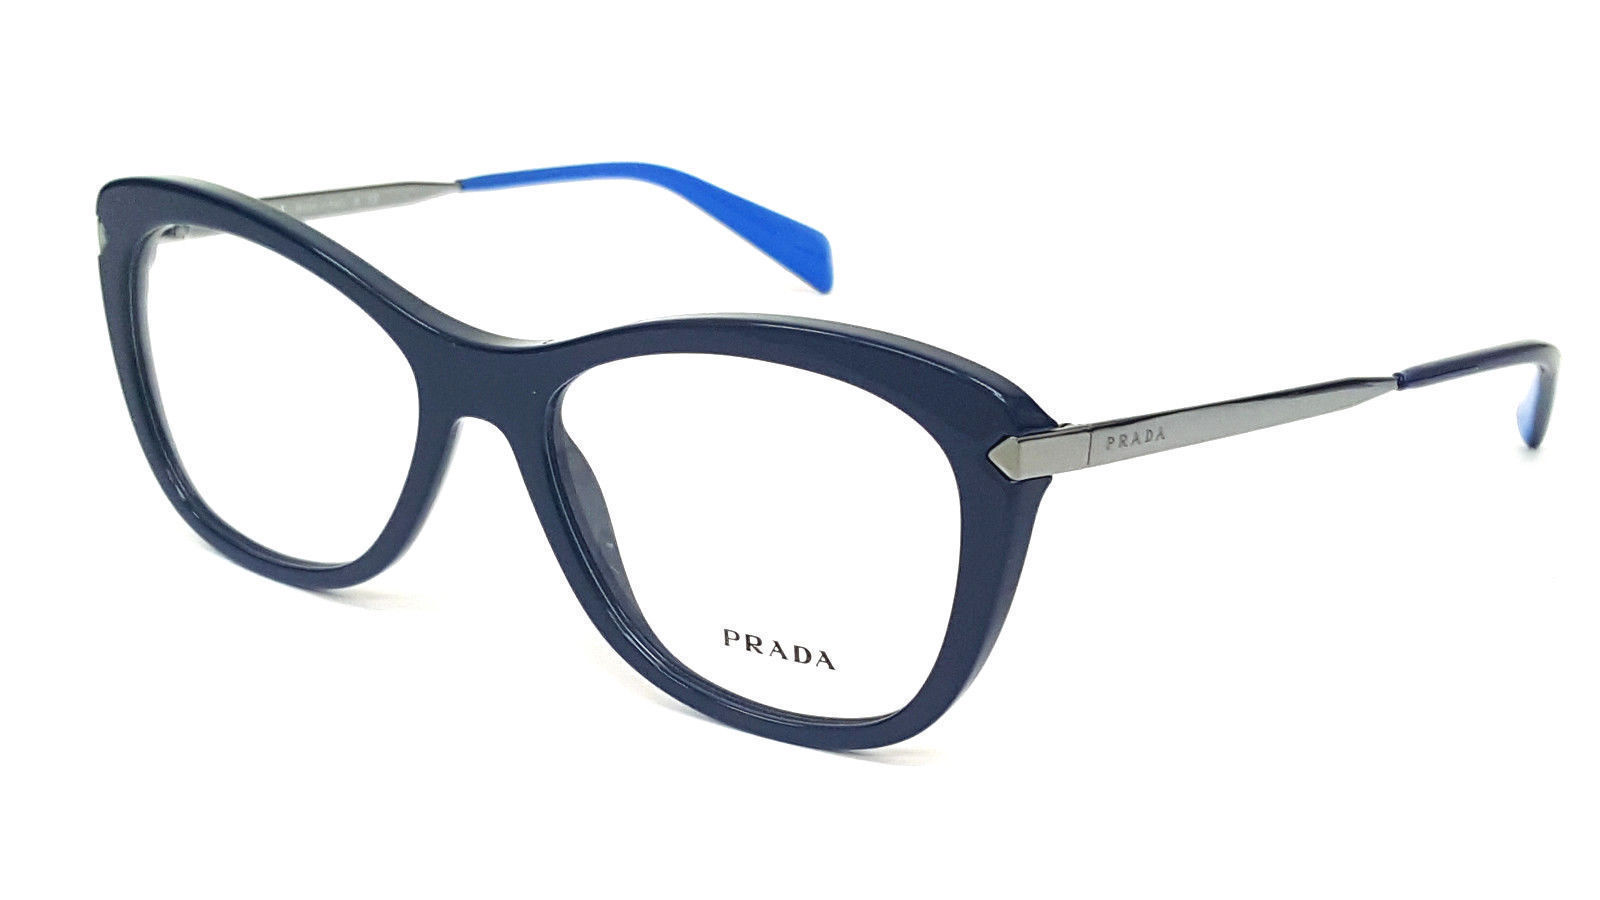 1b8b45afb03 S l1600. S l1600. Prada Women CatEye Eyeglasses Blue Frame Demo Lens VPR09R  TFM1O1 51MM · Prada Women CatEye Eyeglasses ...